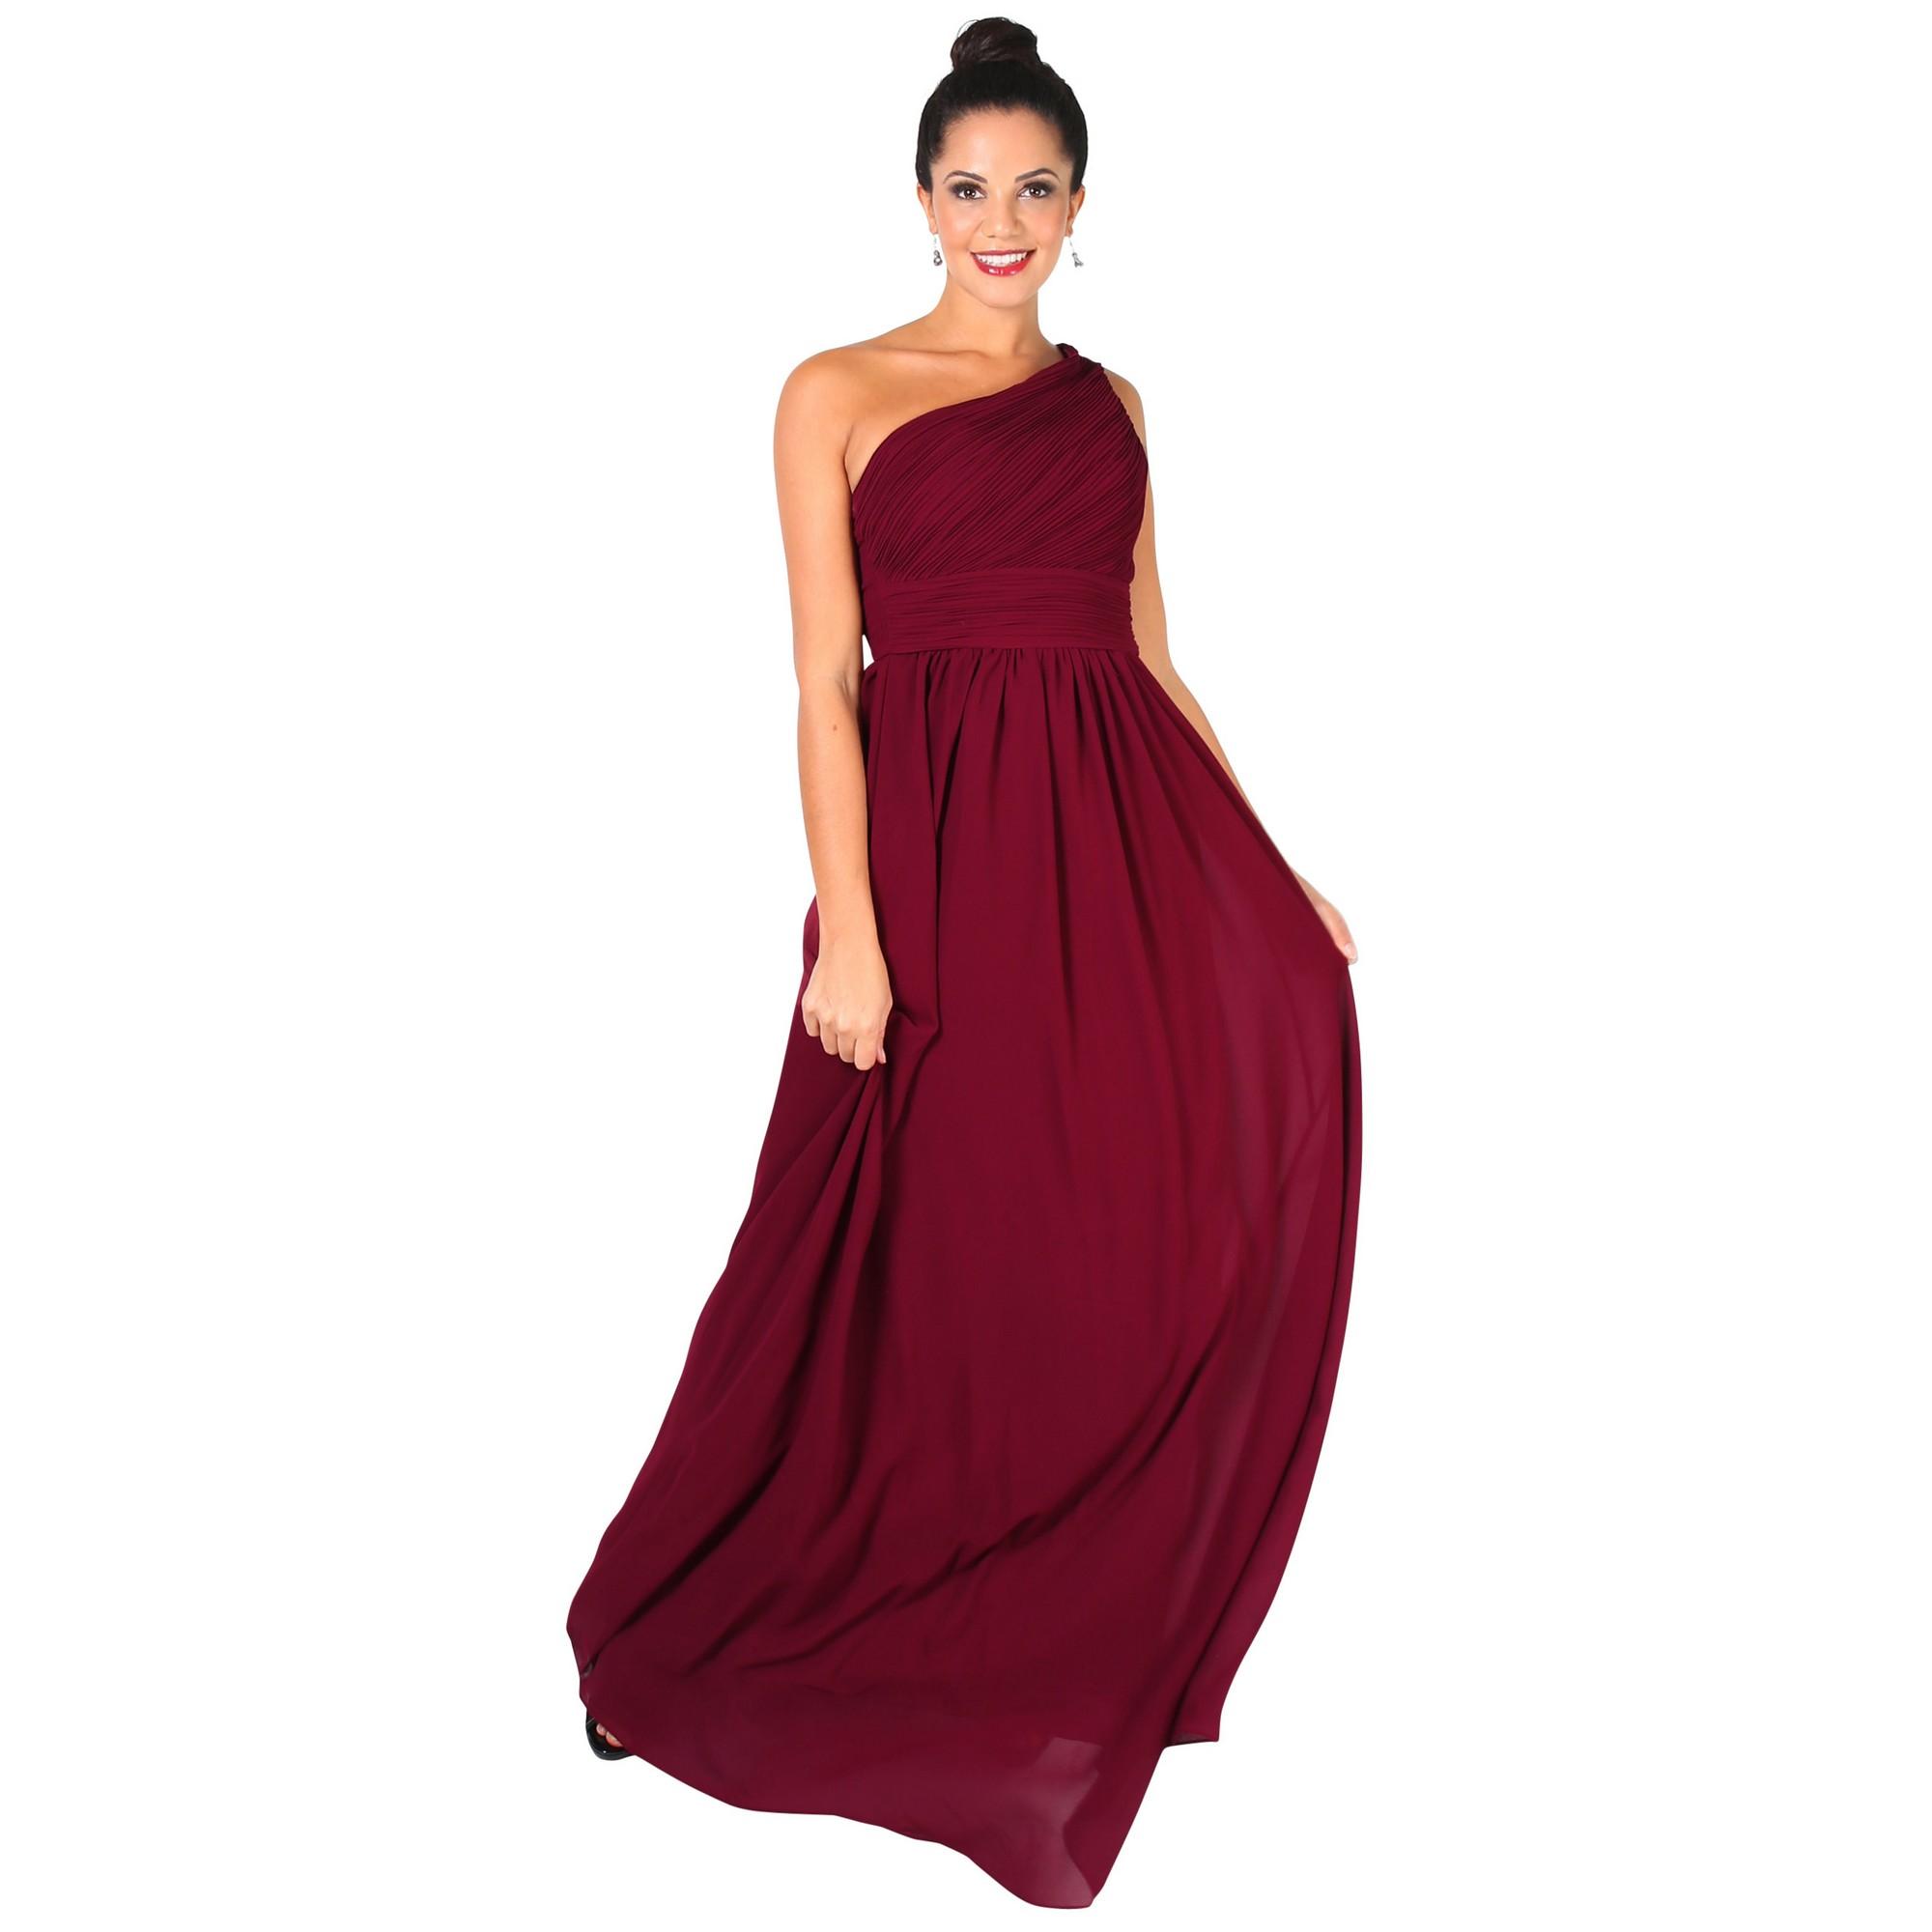 Krisp Womens/Ladies One Shoulder Evening Maxi Dress (18 UK) (Wine)